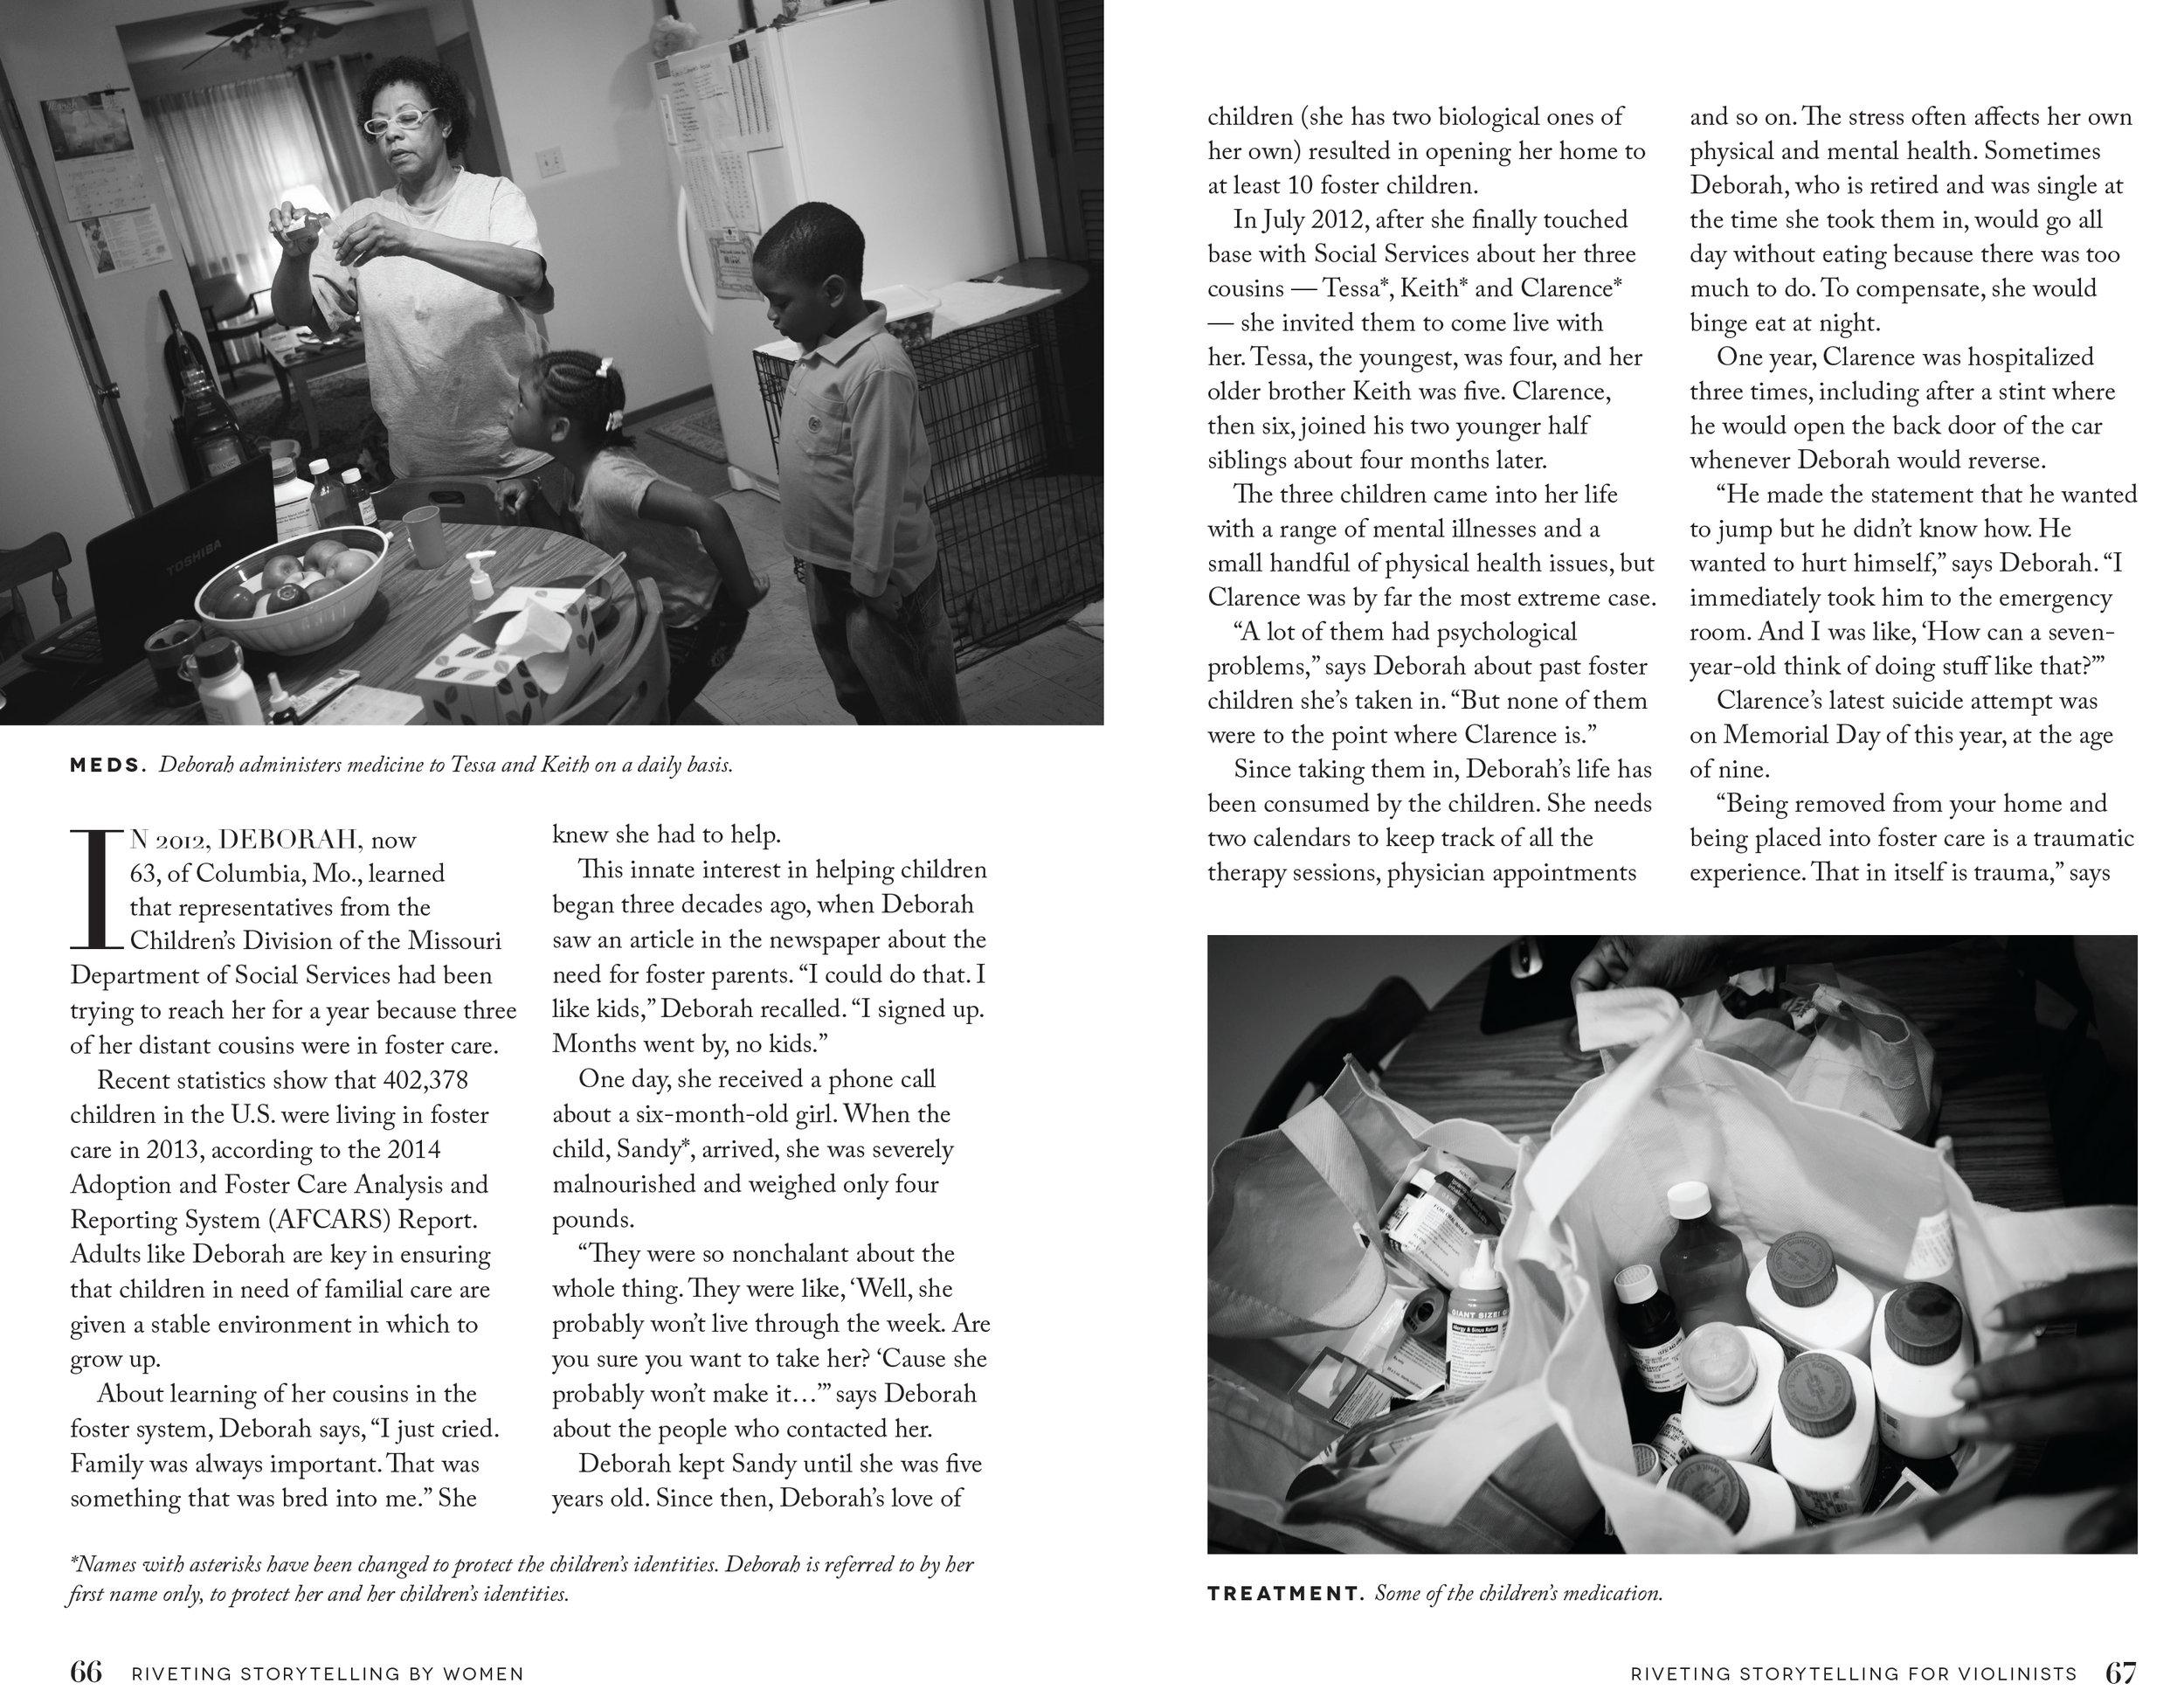 TheRiveter_Issue03_PhotoEssay-2.jpg